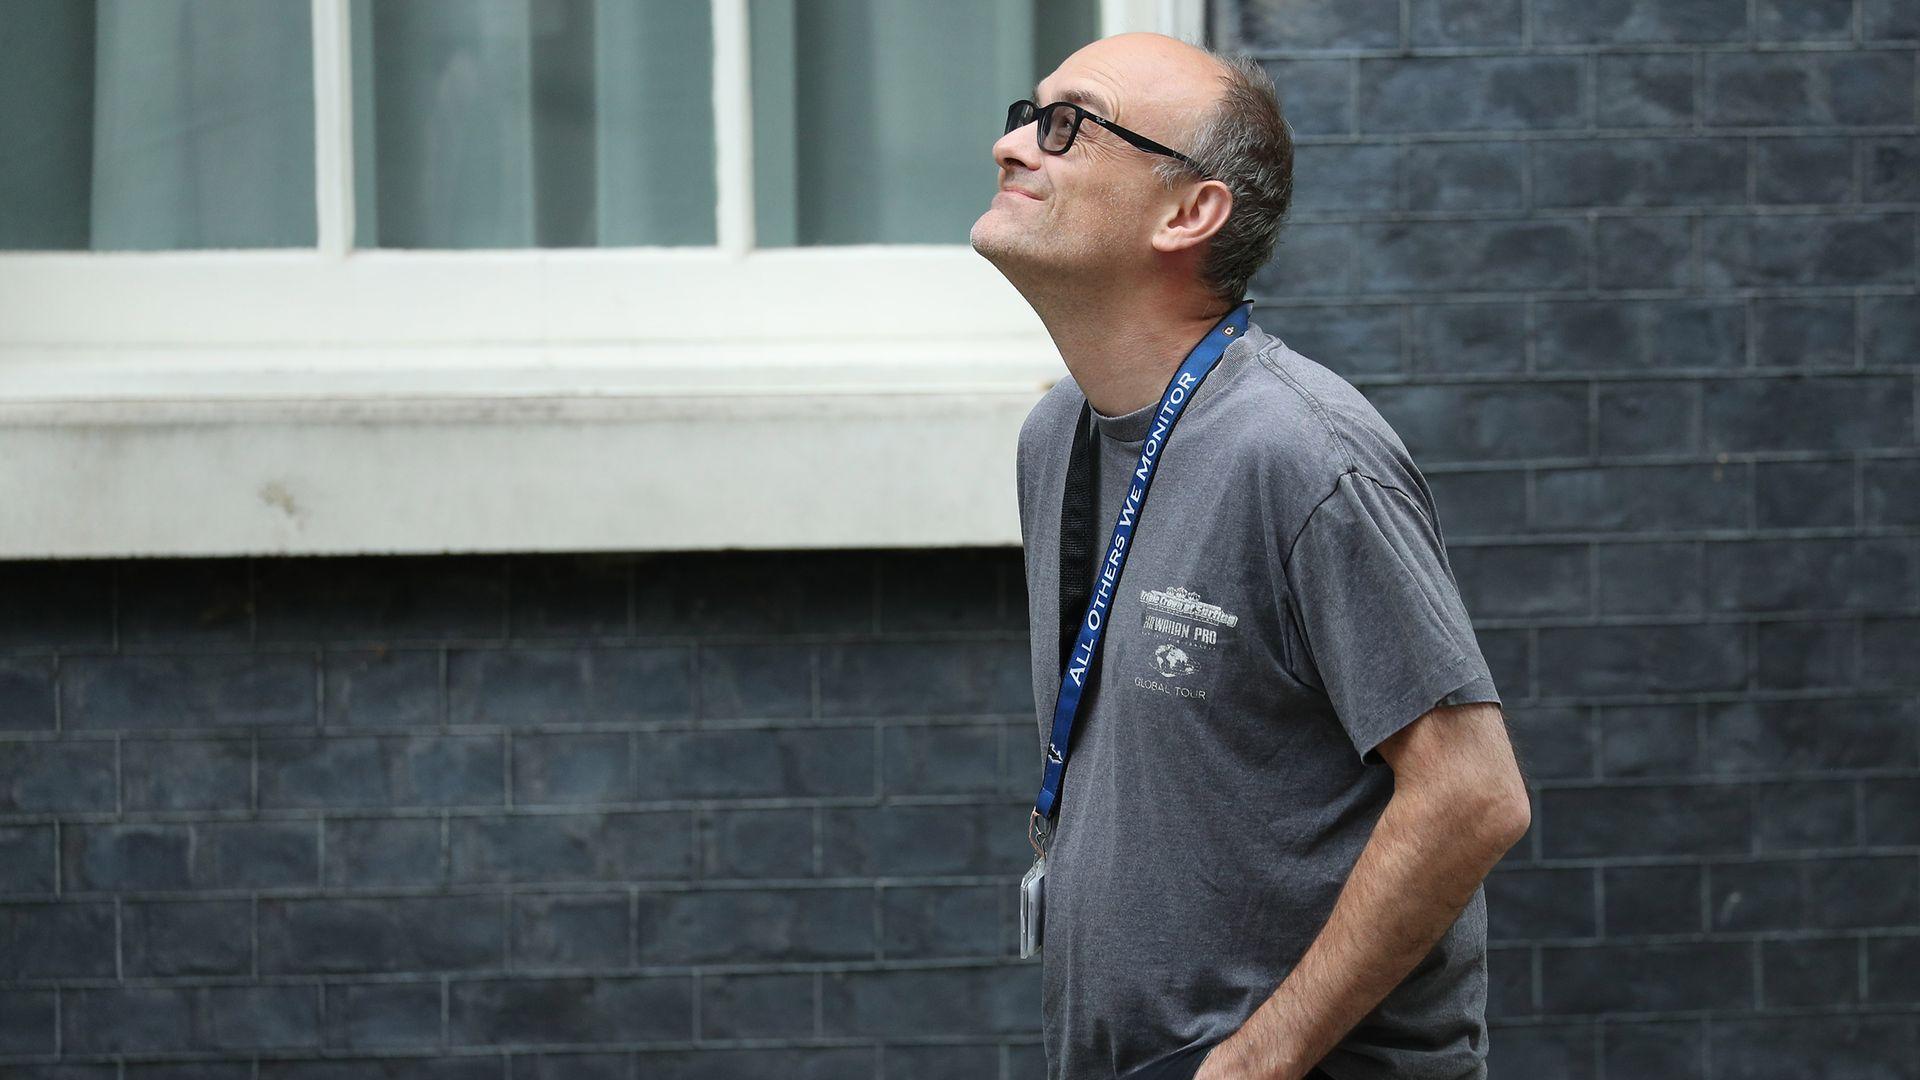 Senior aide to prime minister Boris Johnson, Dominic Cummings in Downing Street, London. - Credit: PA